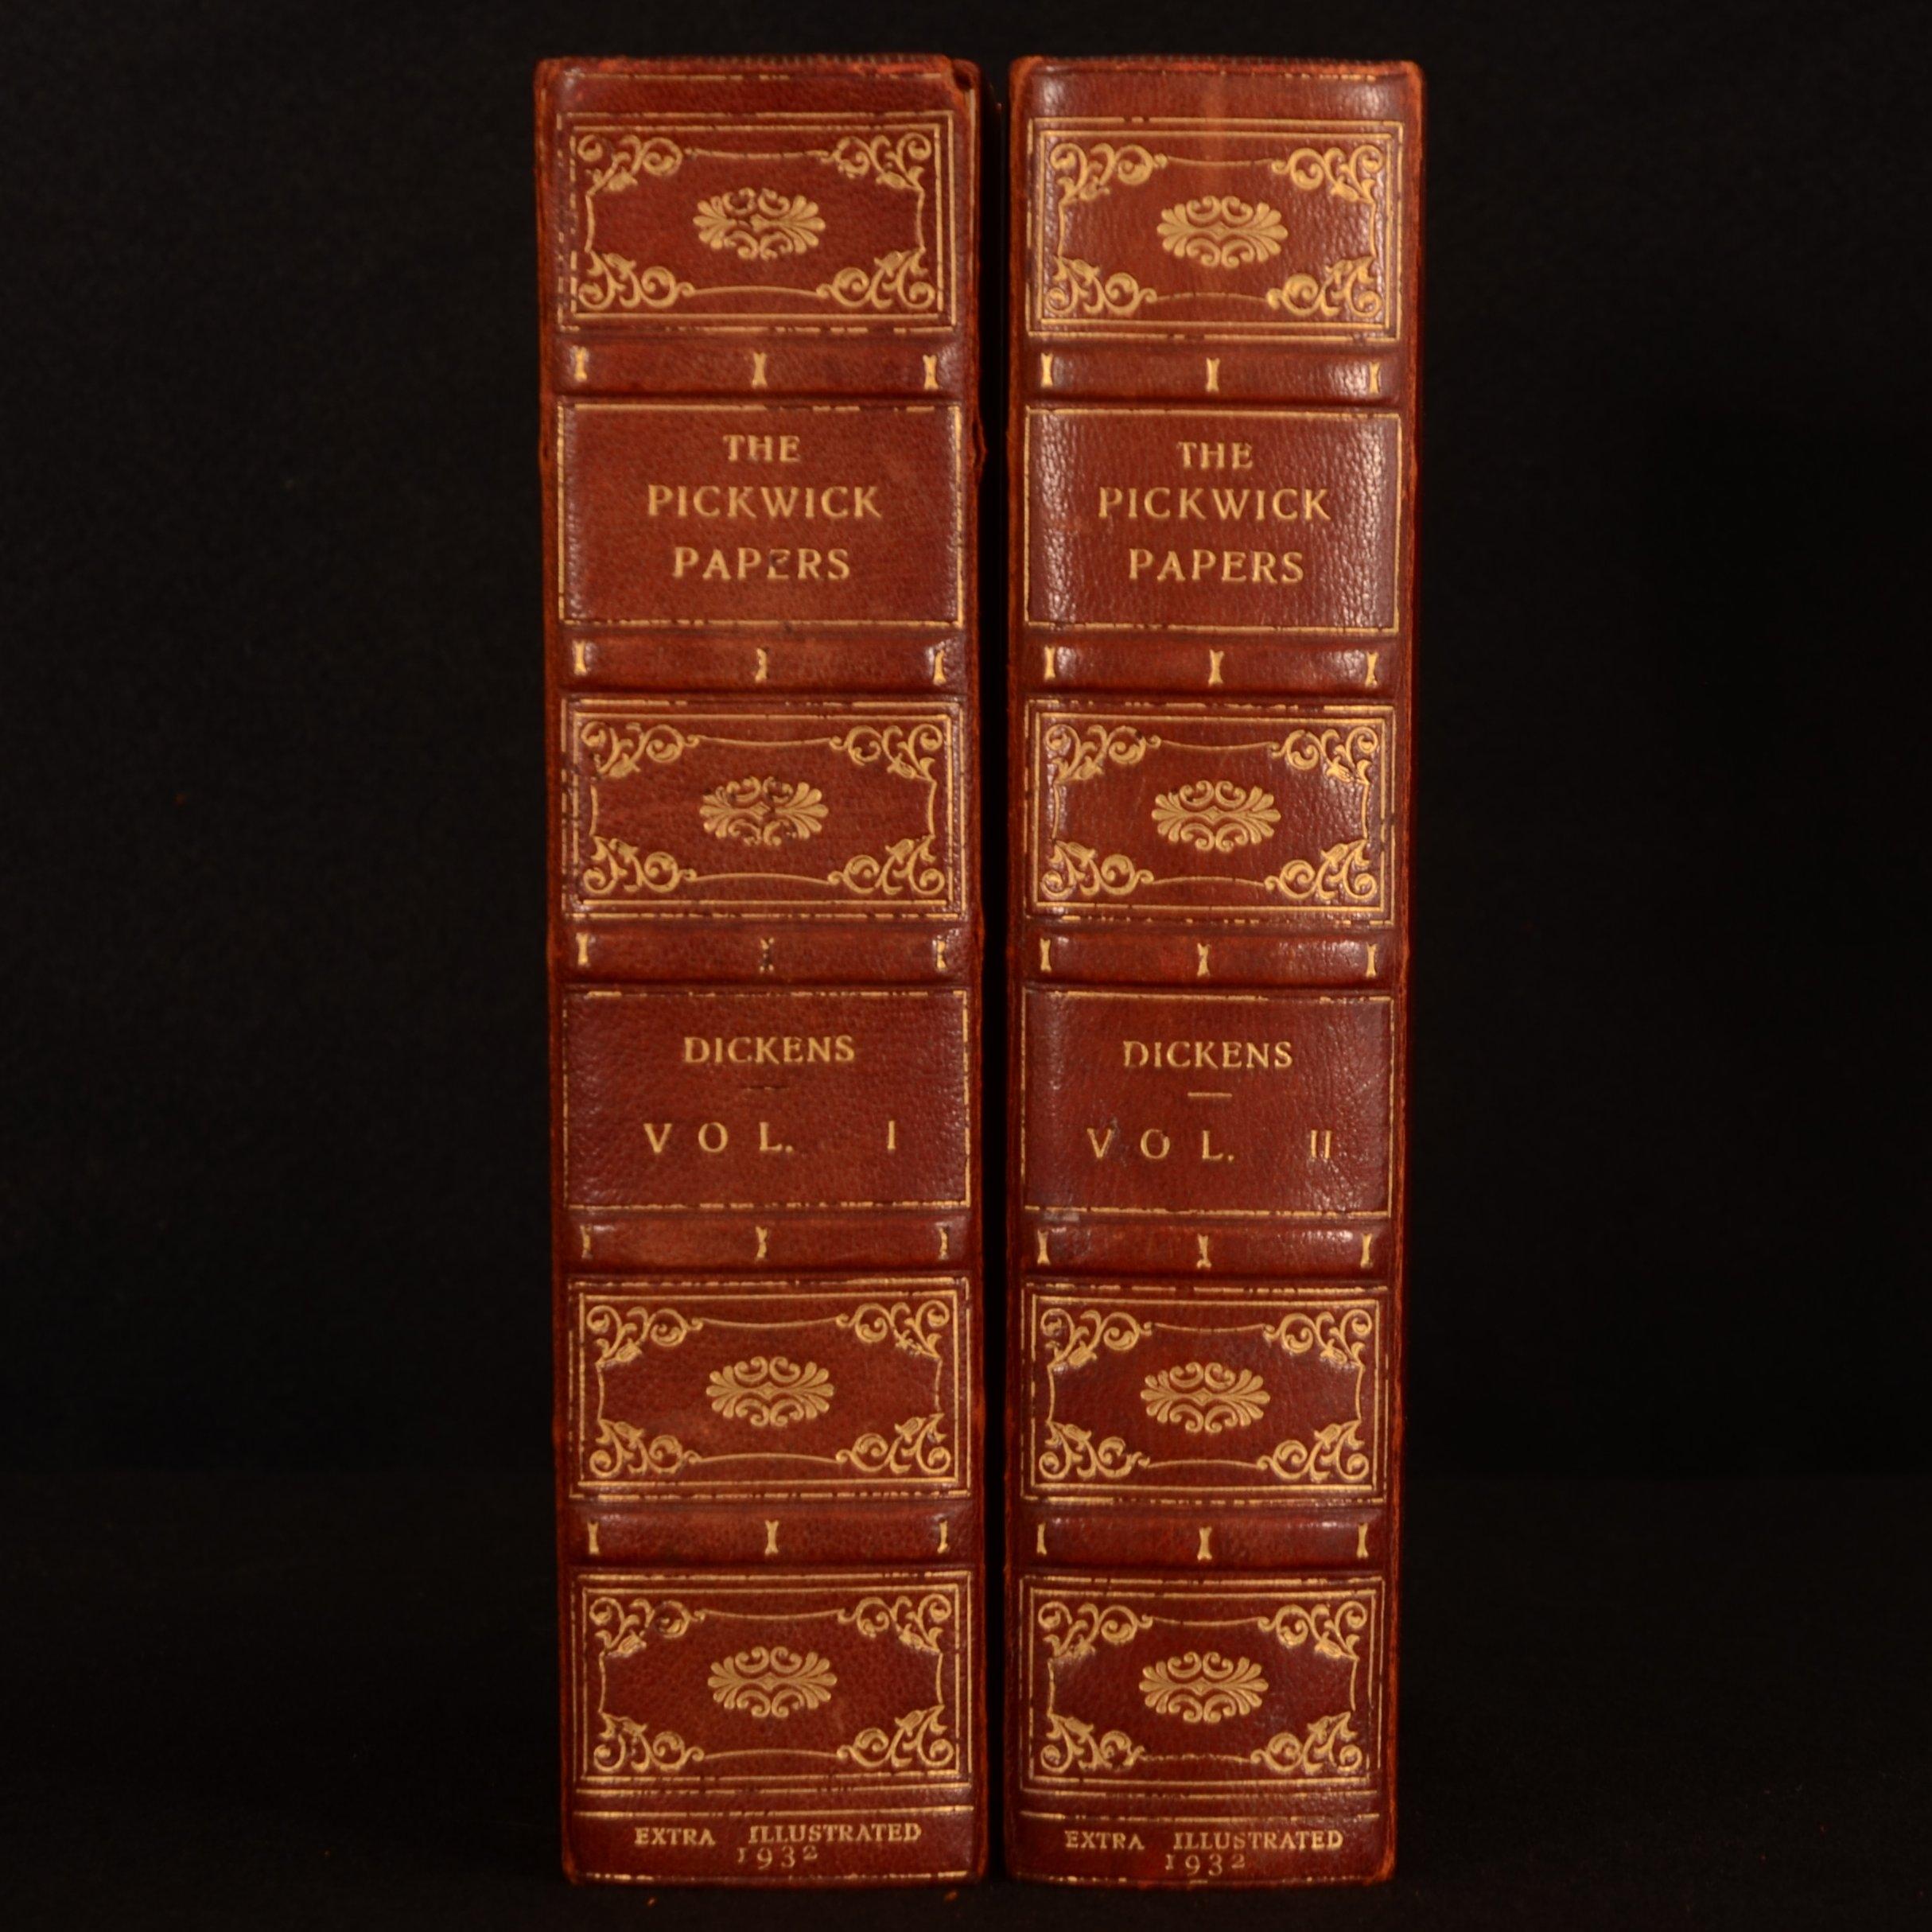 1932 2vol Pickwick Papers Dickens Bayntun Binding Lombard